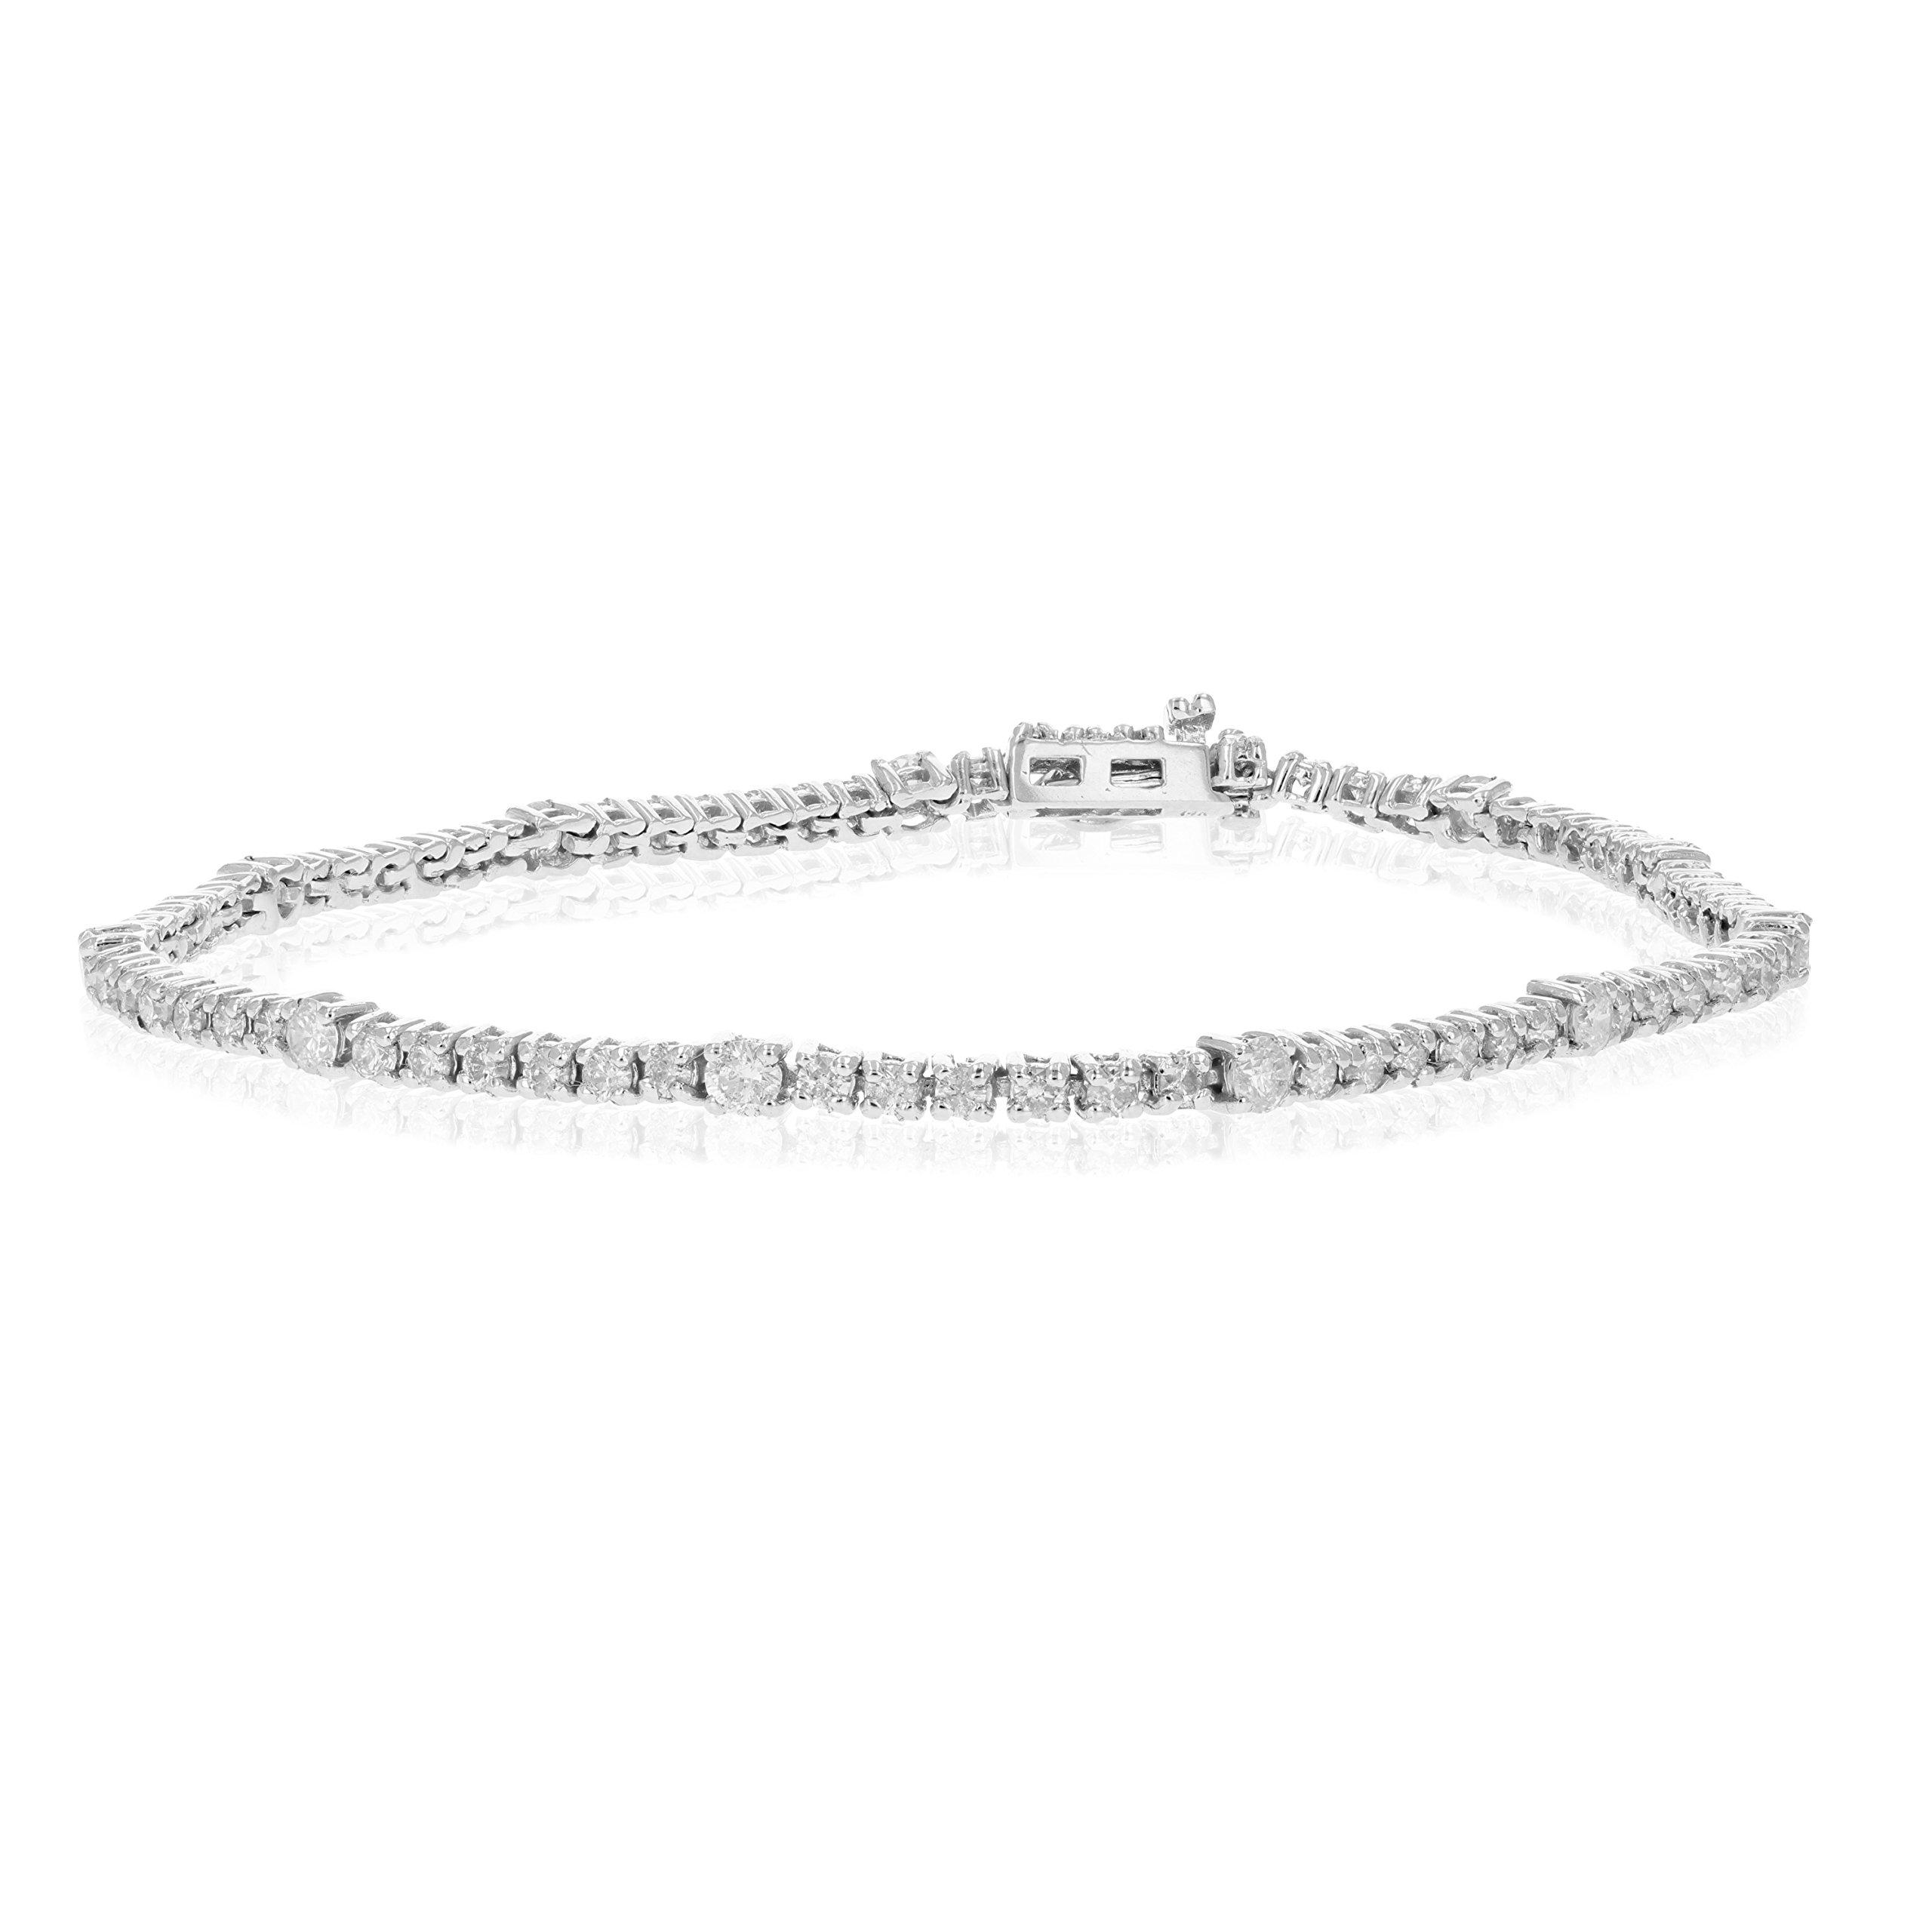 2 CT Diamond Bracelet Tennis Style 14K White Gold by Vir Jewels